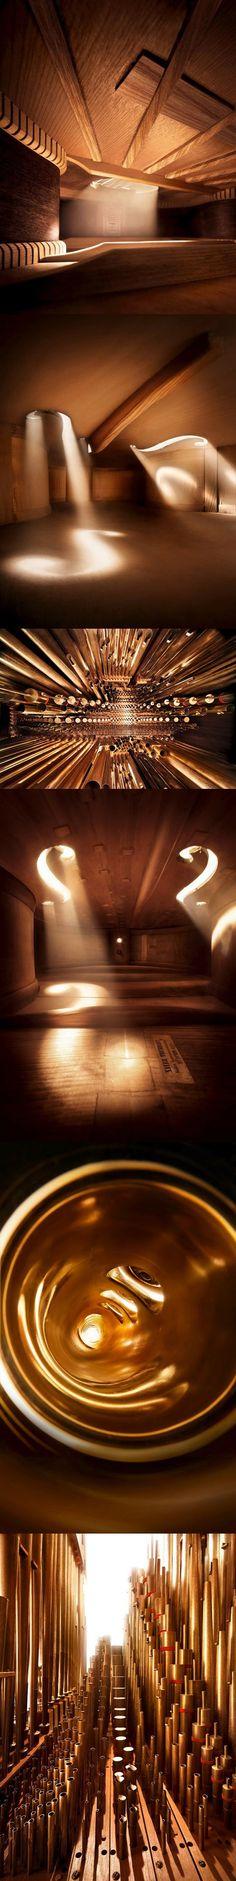 Inside beautiful musical instruments...